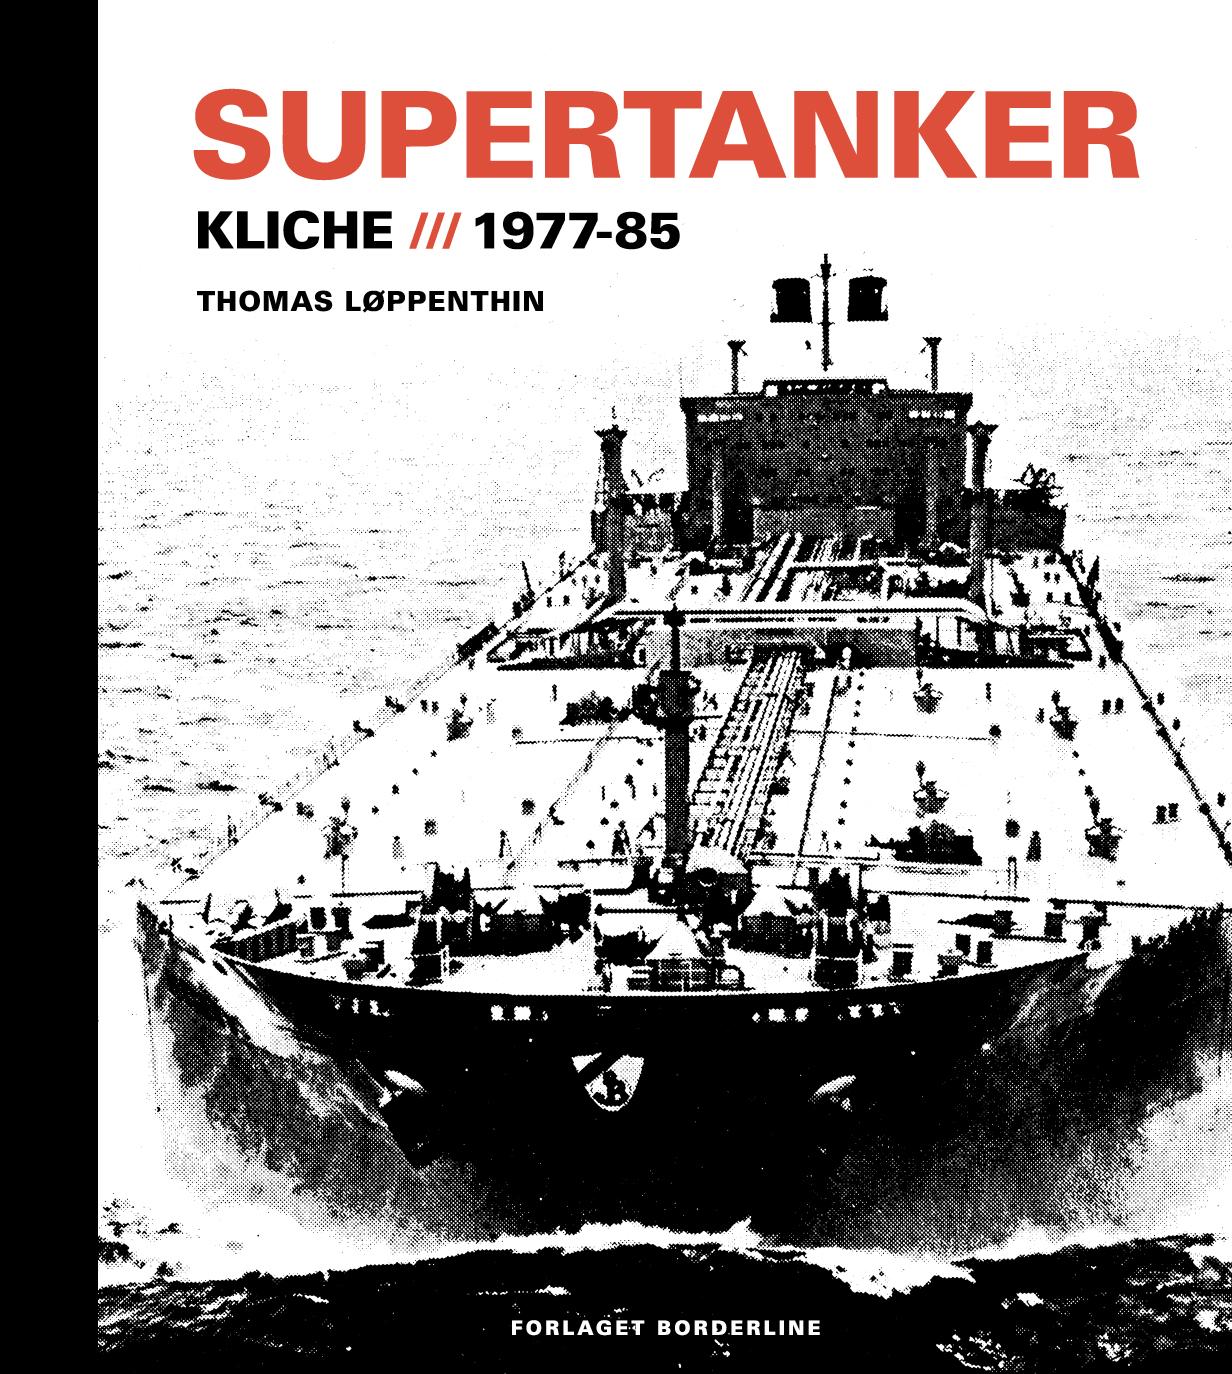 Supertanker - Kliché, 1977-85 - Thomas Løppenthin - Bøger - Forlaget Borderline - 9788797168103 - 6/12-2019